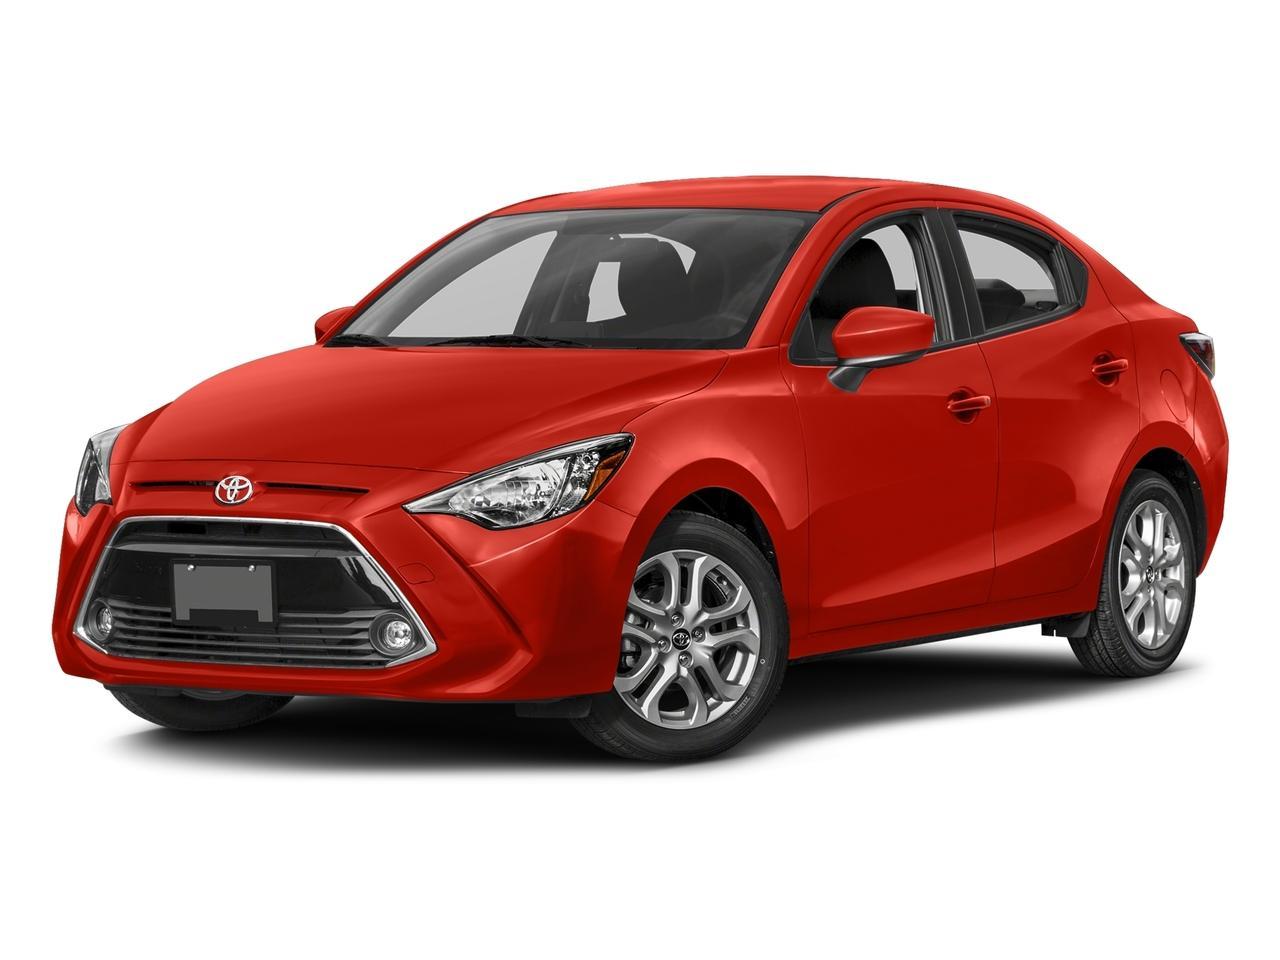 2017 Toyota Yaris iA Vehicle Photo in Richmond, TX 77469